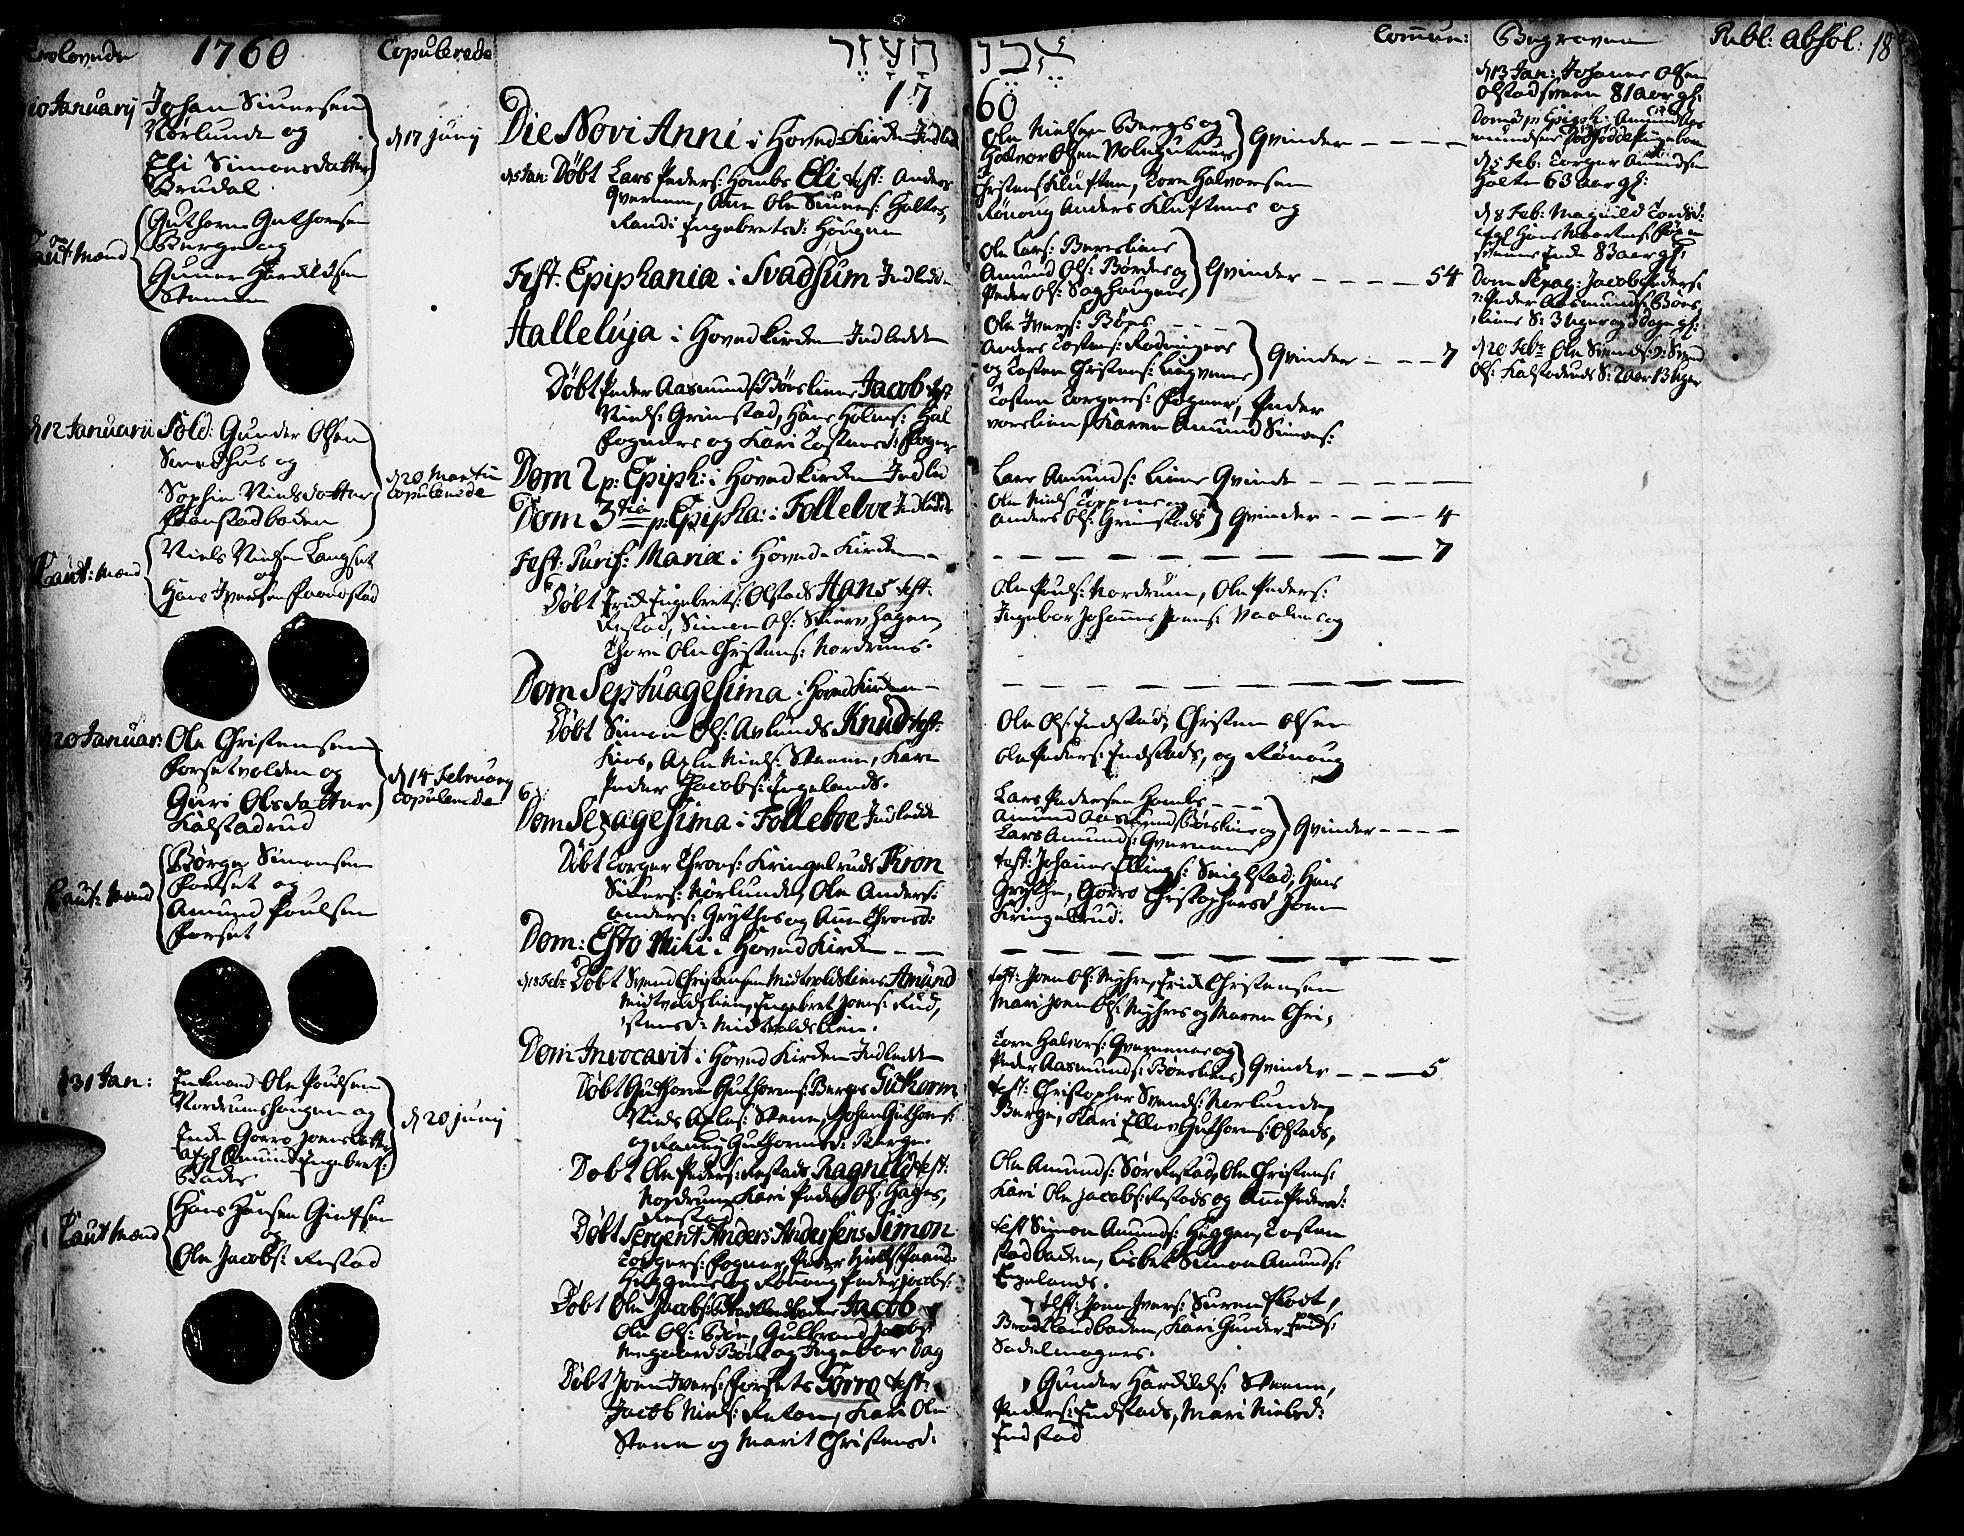 SAH, Gausdal prestekontor, Ministerialbok nr. 3, 1758-1809, s. 18